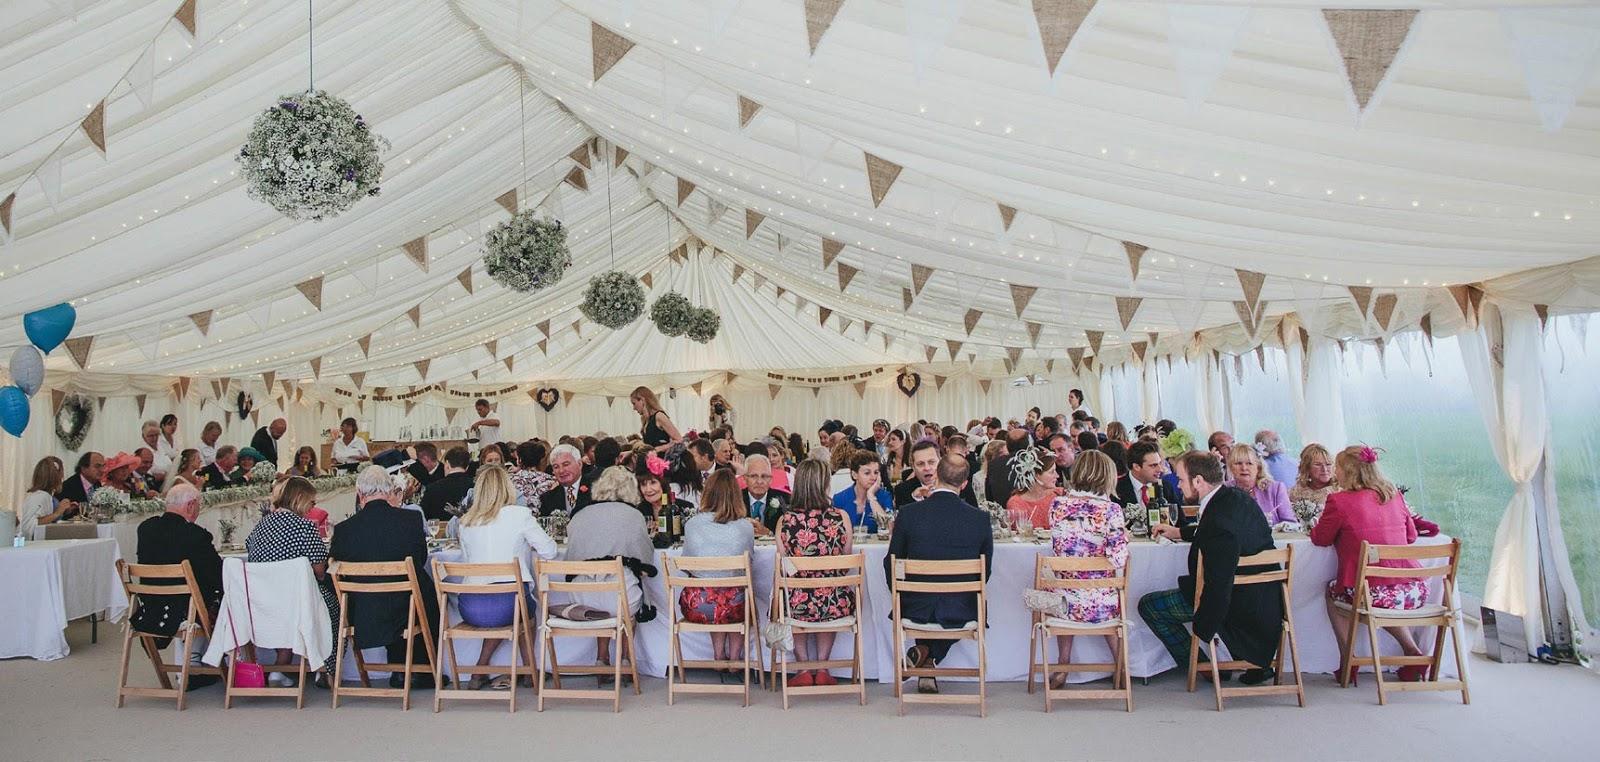 Choose The Best Wedding Venues In Essex Area Mypanyu